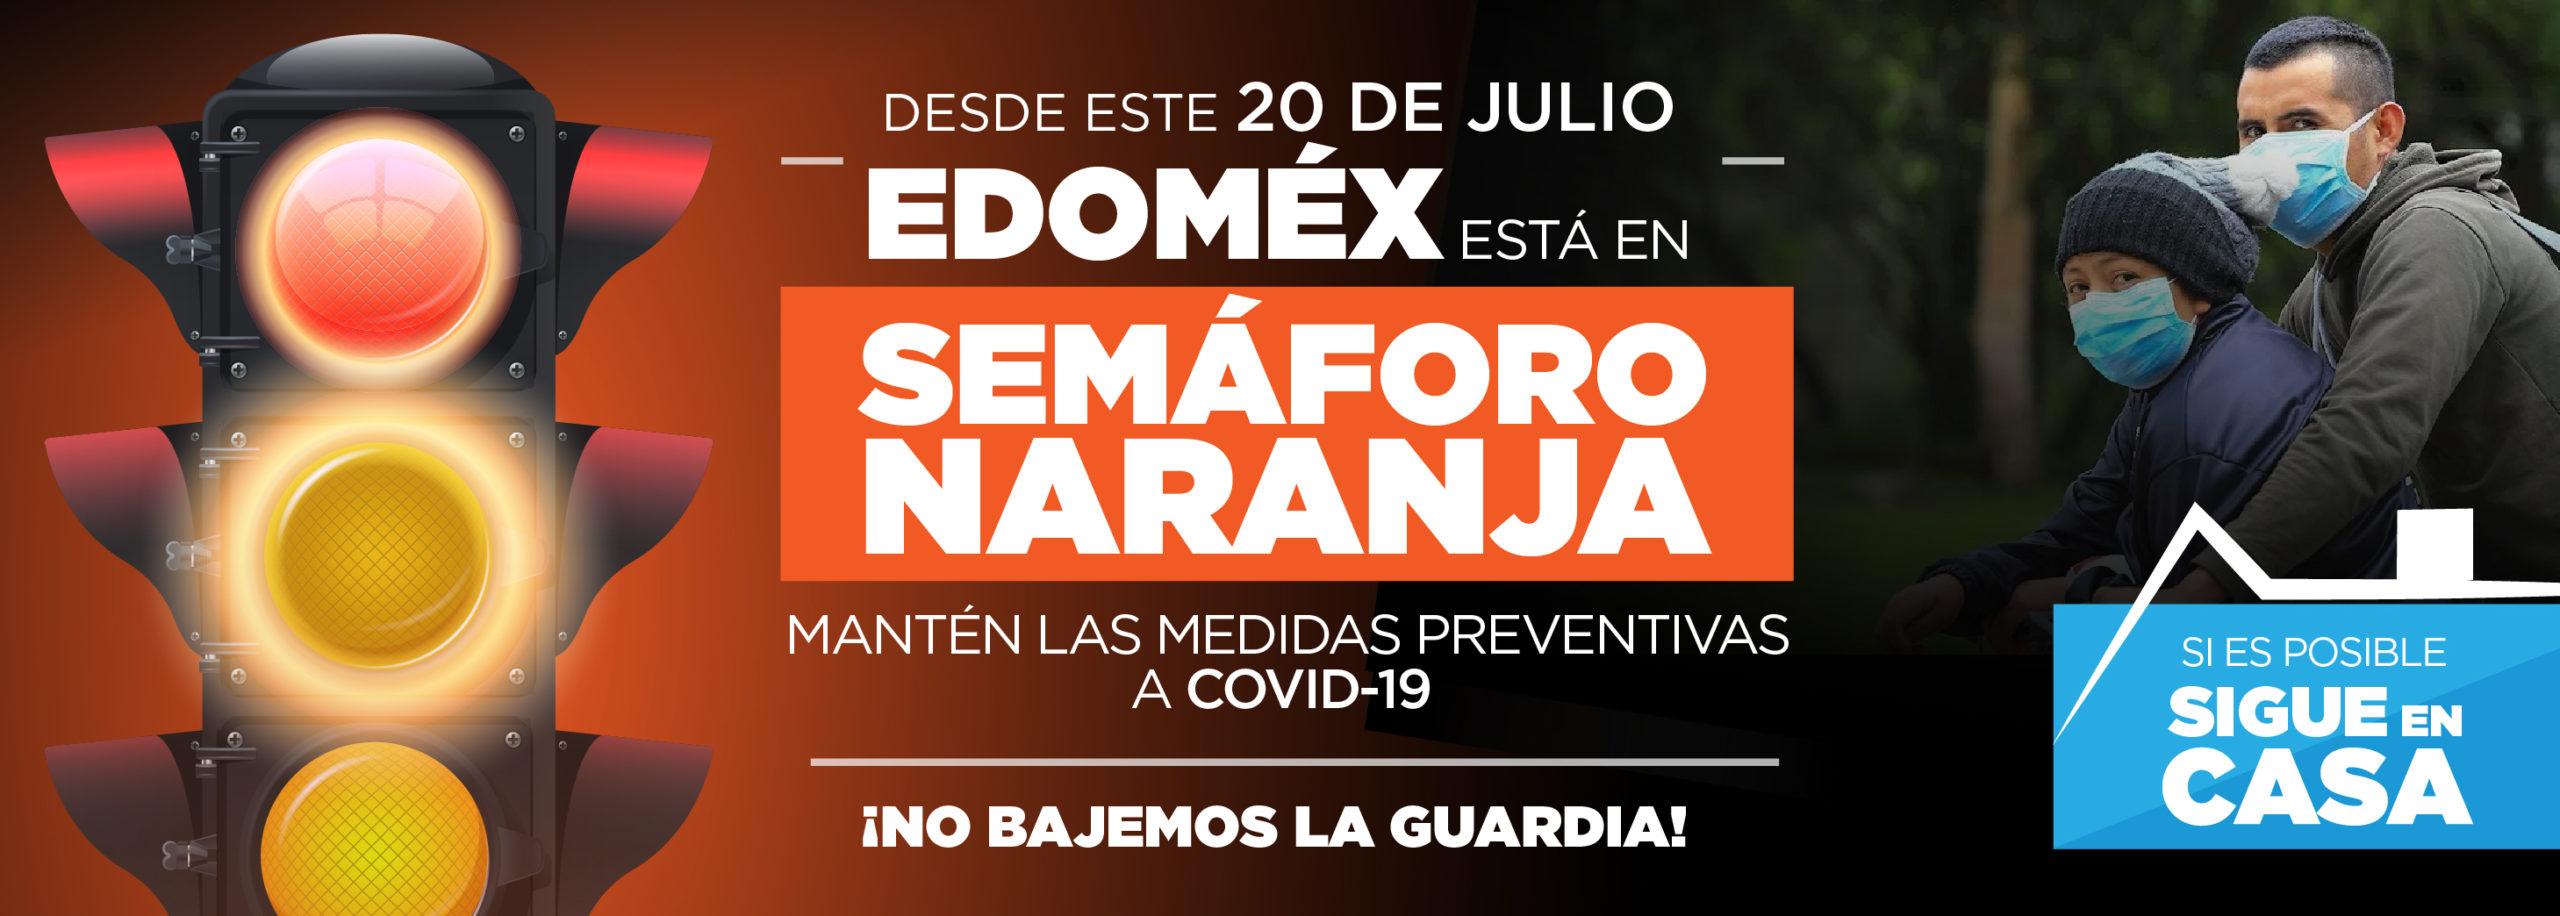 edomex naranja